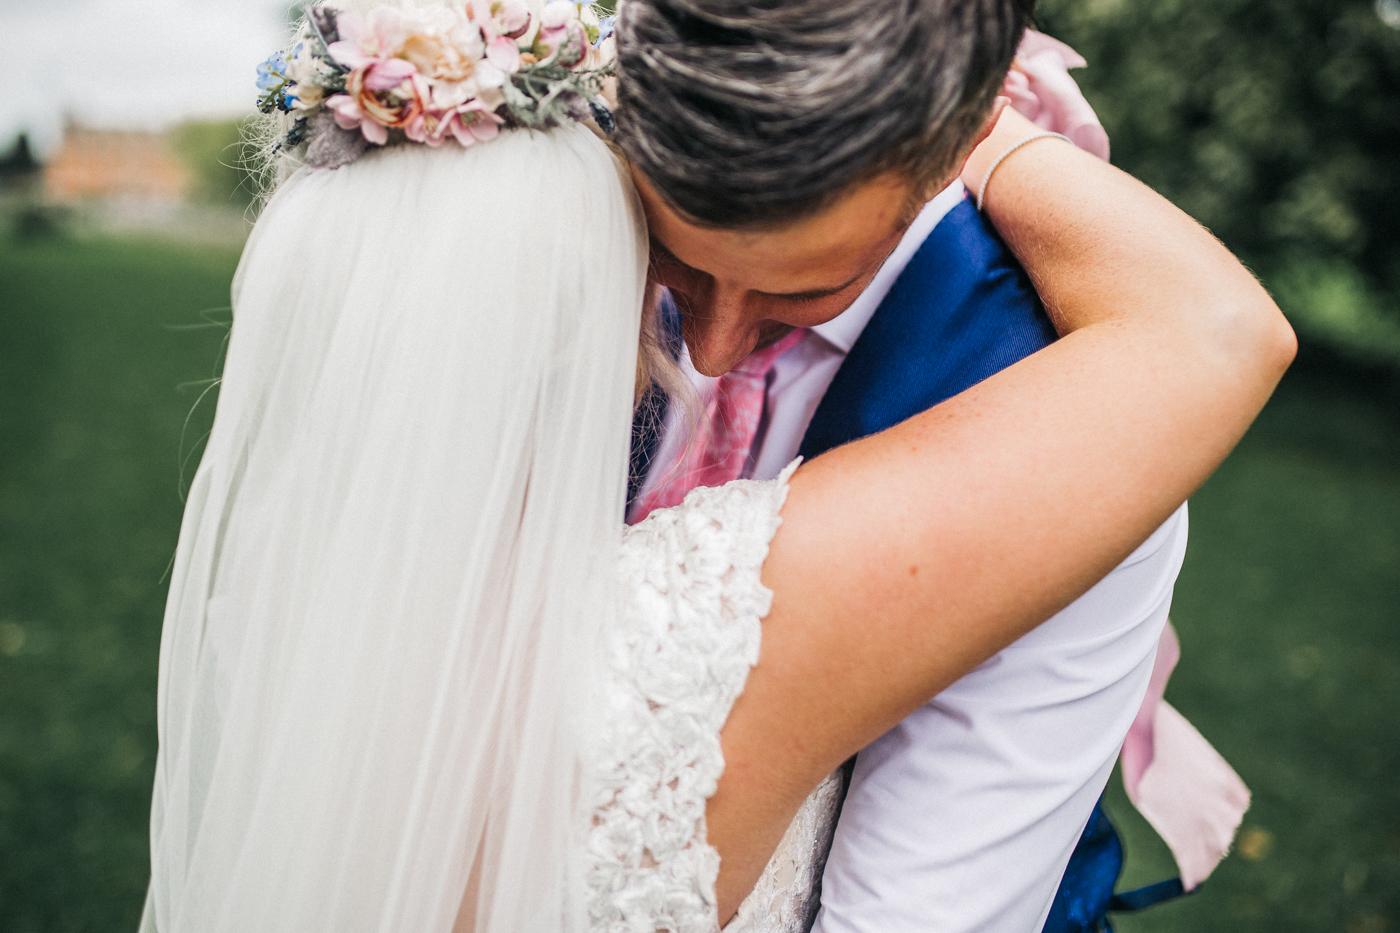 teesside-middlesbrough-north-east-wedding-photographer-creative-wedding-venues-0147.jpg